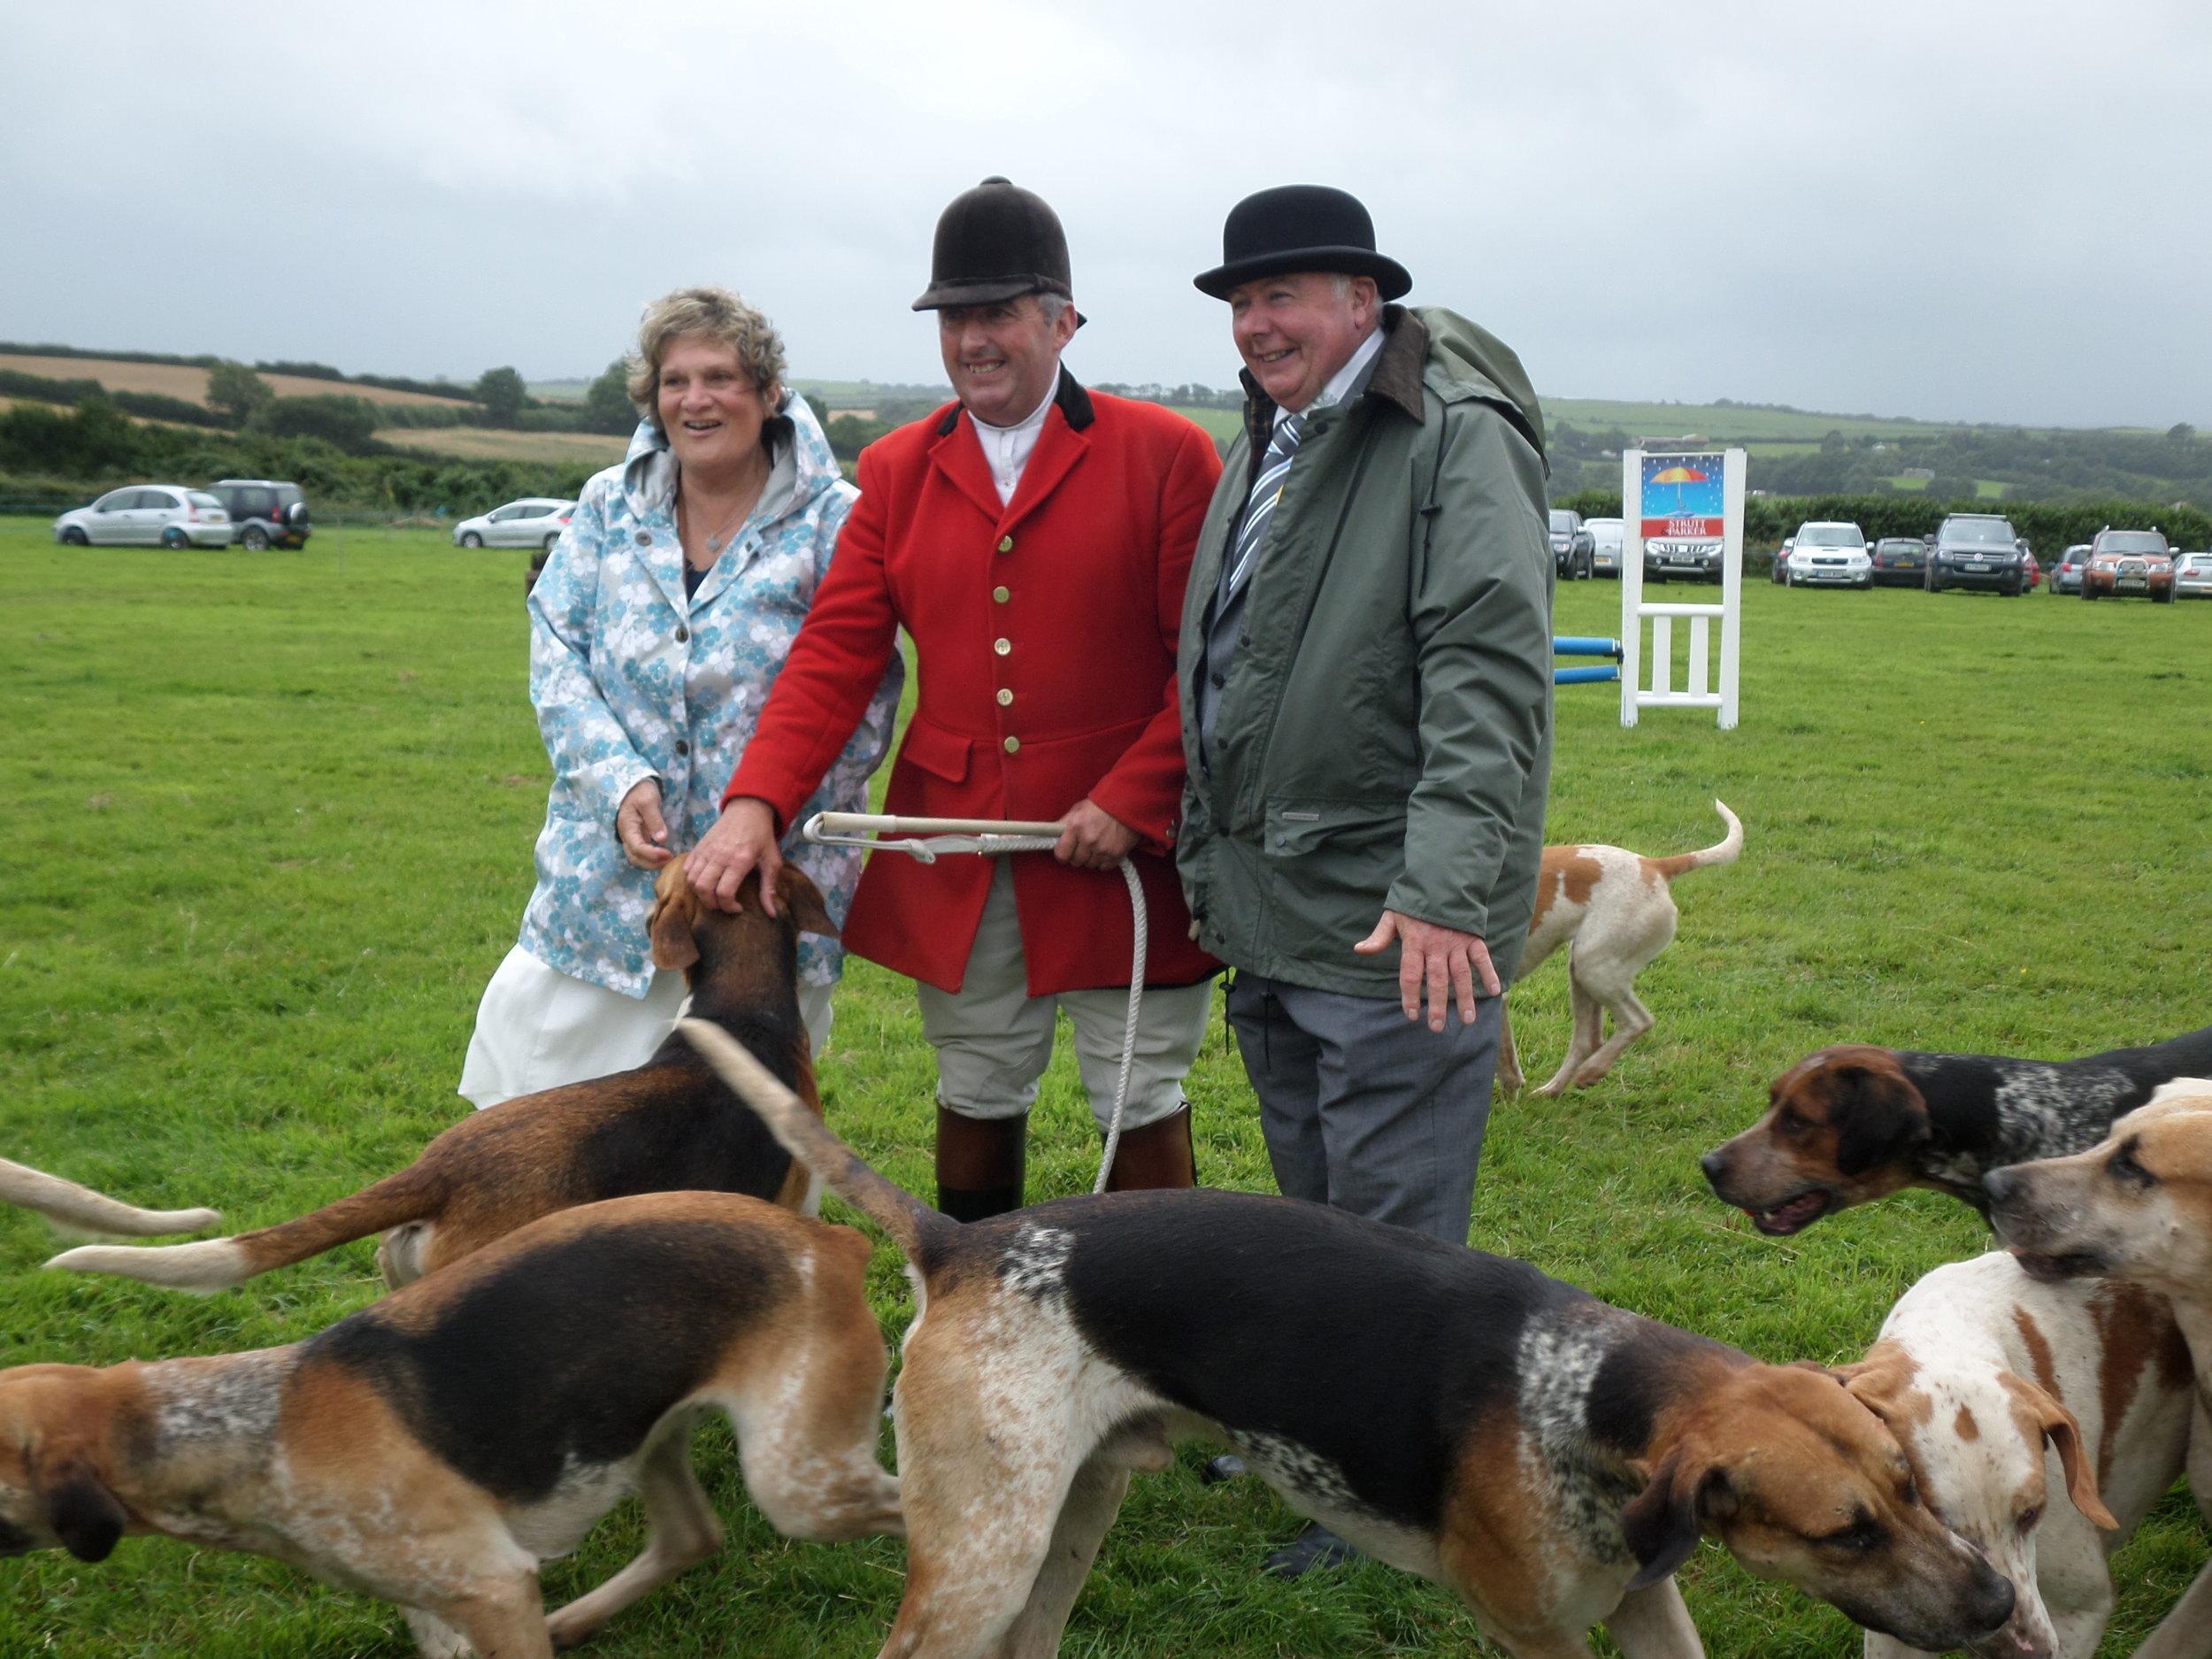 President Derek Banbury with wife Linda and Paul Martin of South Tetcott Hunt